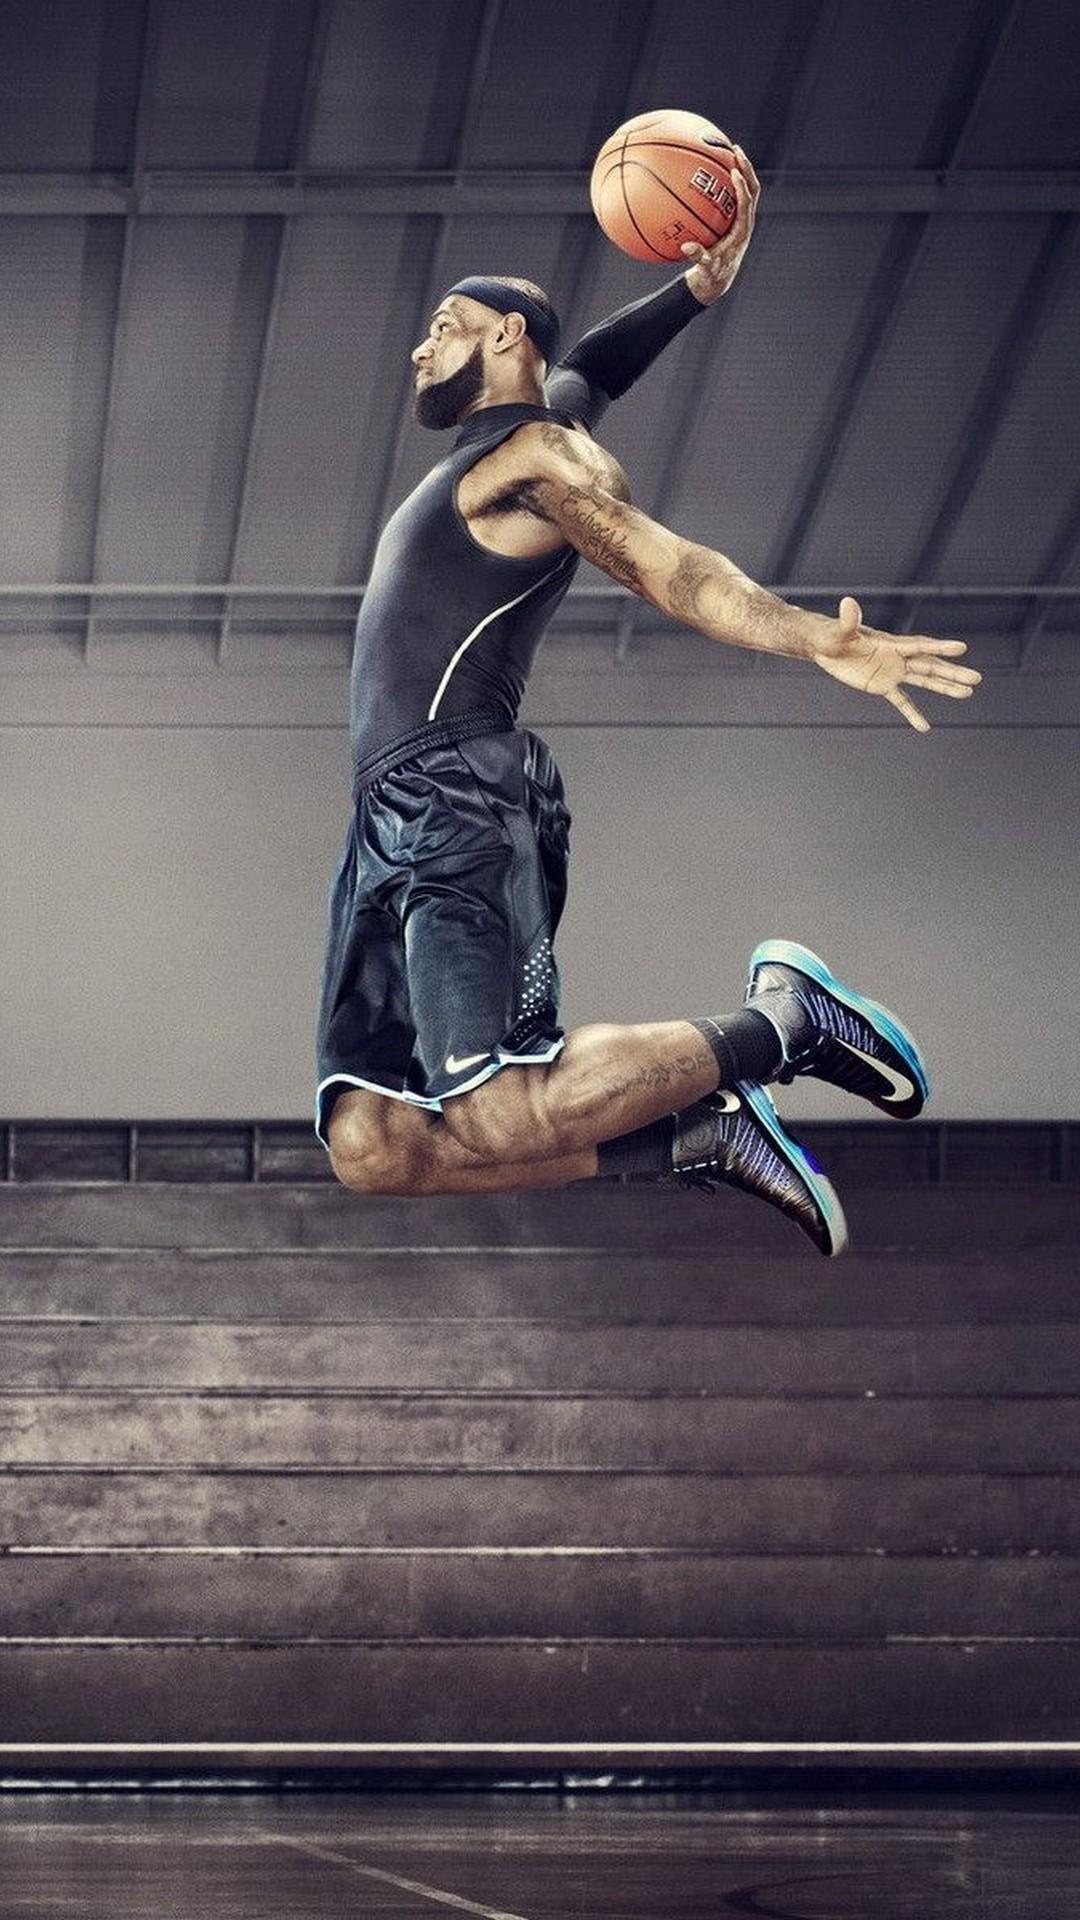 NBA Basketball Mobile Wallpaper HD 2020 Basketball Wallpaper 1080x1920